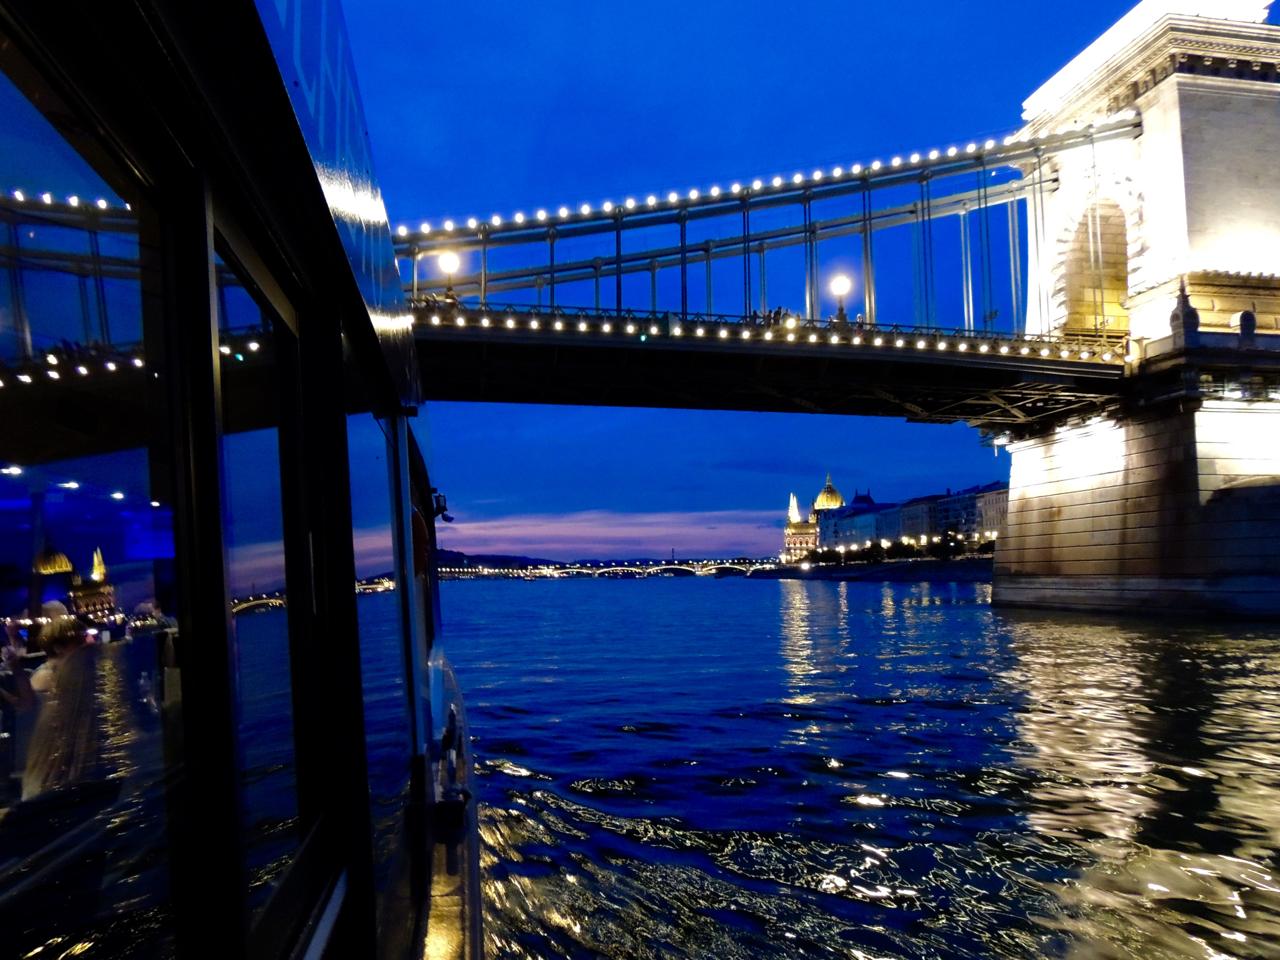 Budapest Dunai Etteremhajo Valentin napi vacsora.jpg